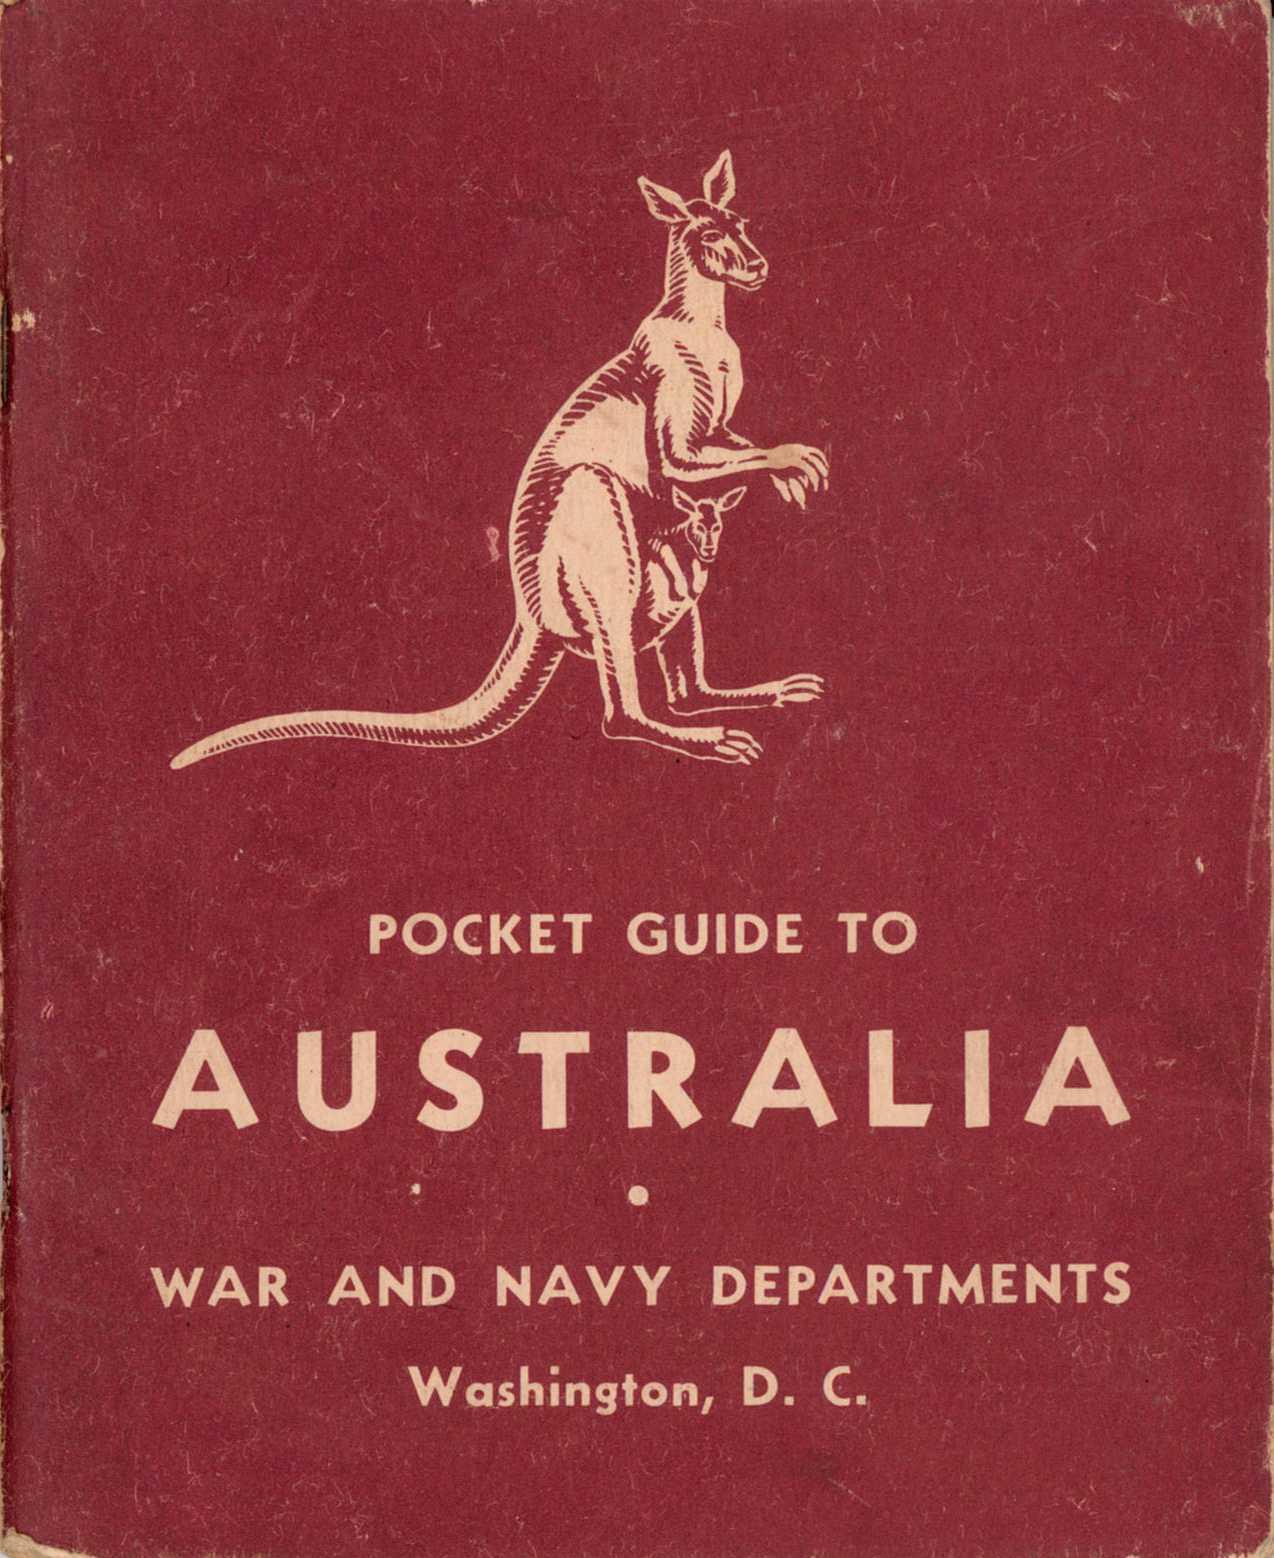 Pocket Guide to Australia                             cover